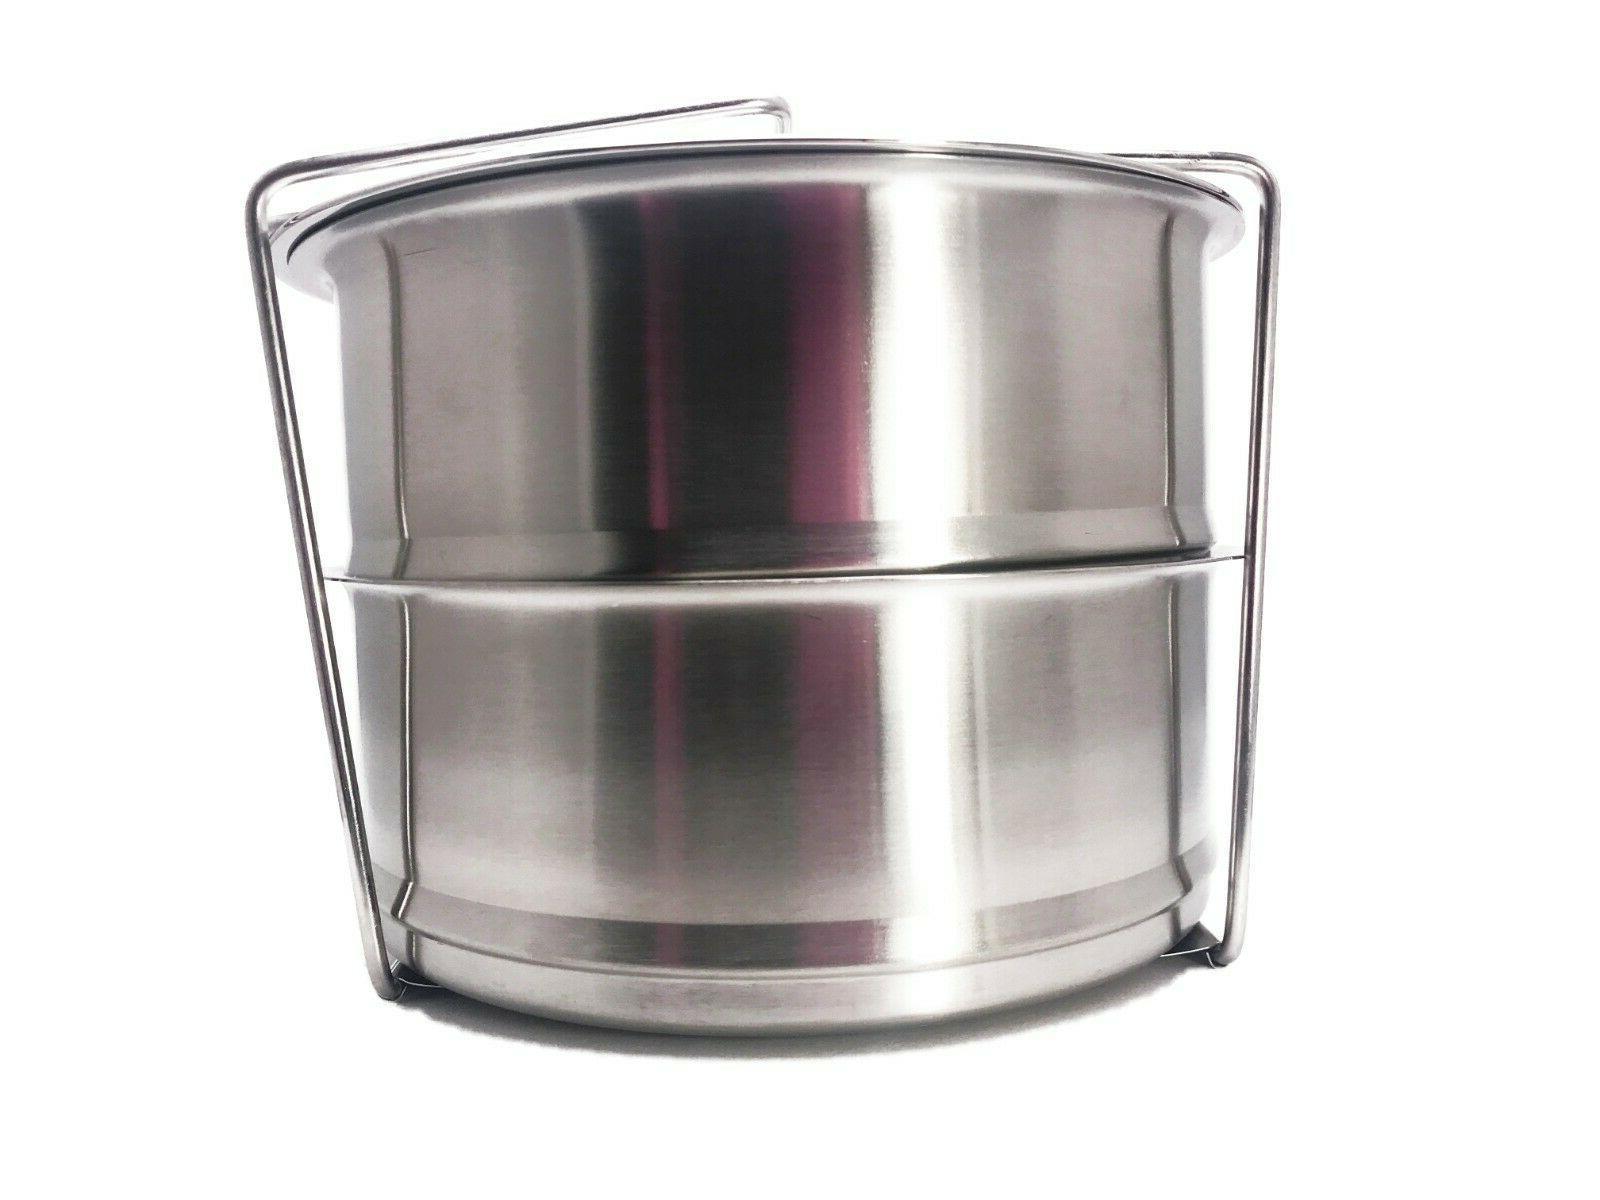 Instant -8 Stackable Steel Steamer Pans